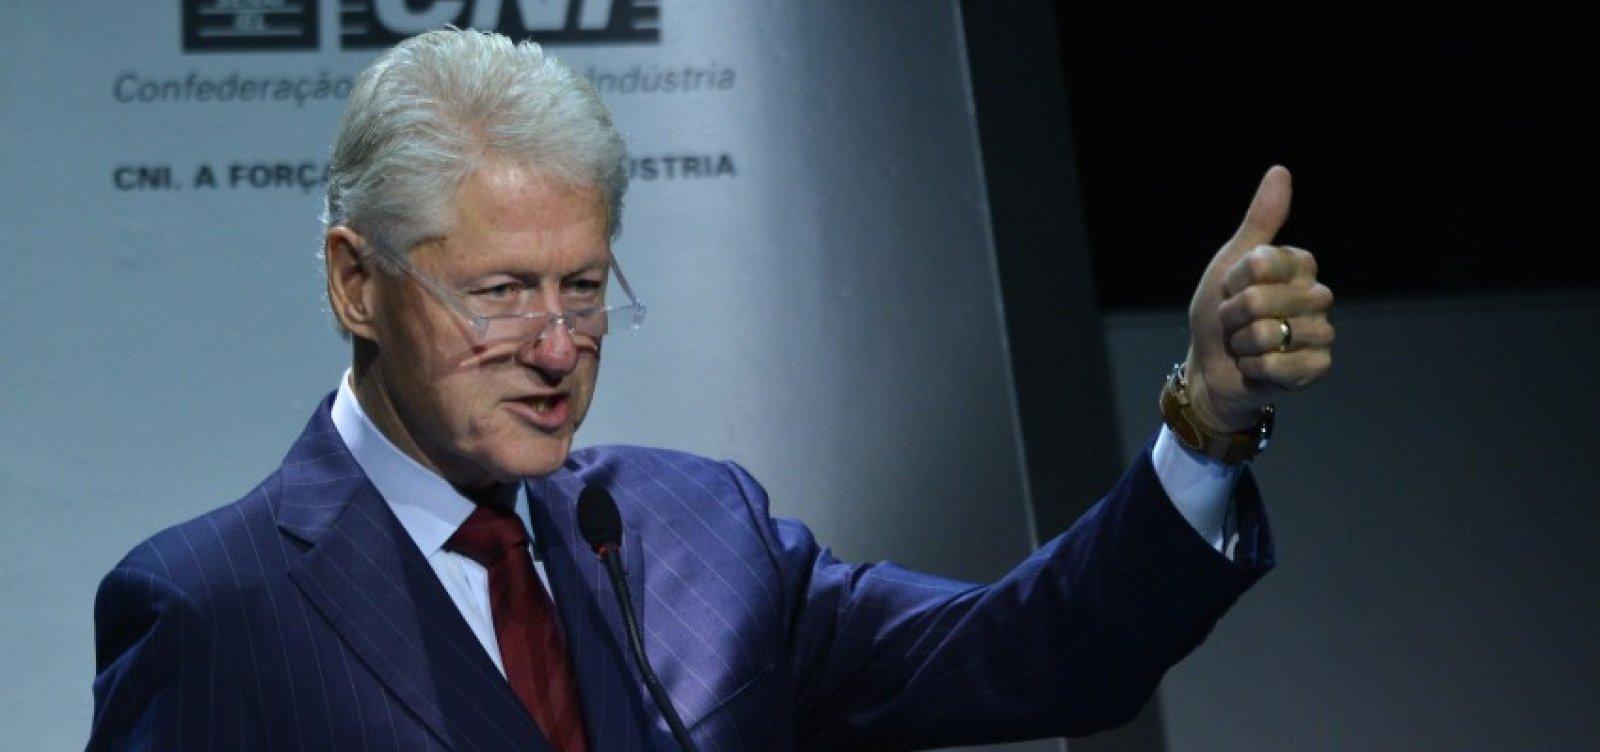 Após cinco dias internado, ex-presidente dos EUA, Bill Clinton, recebe alta